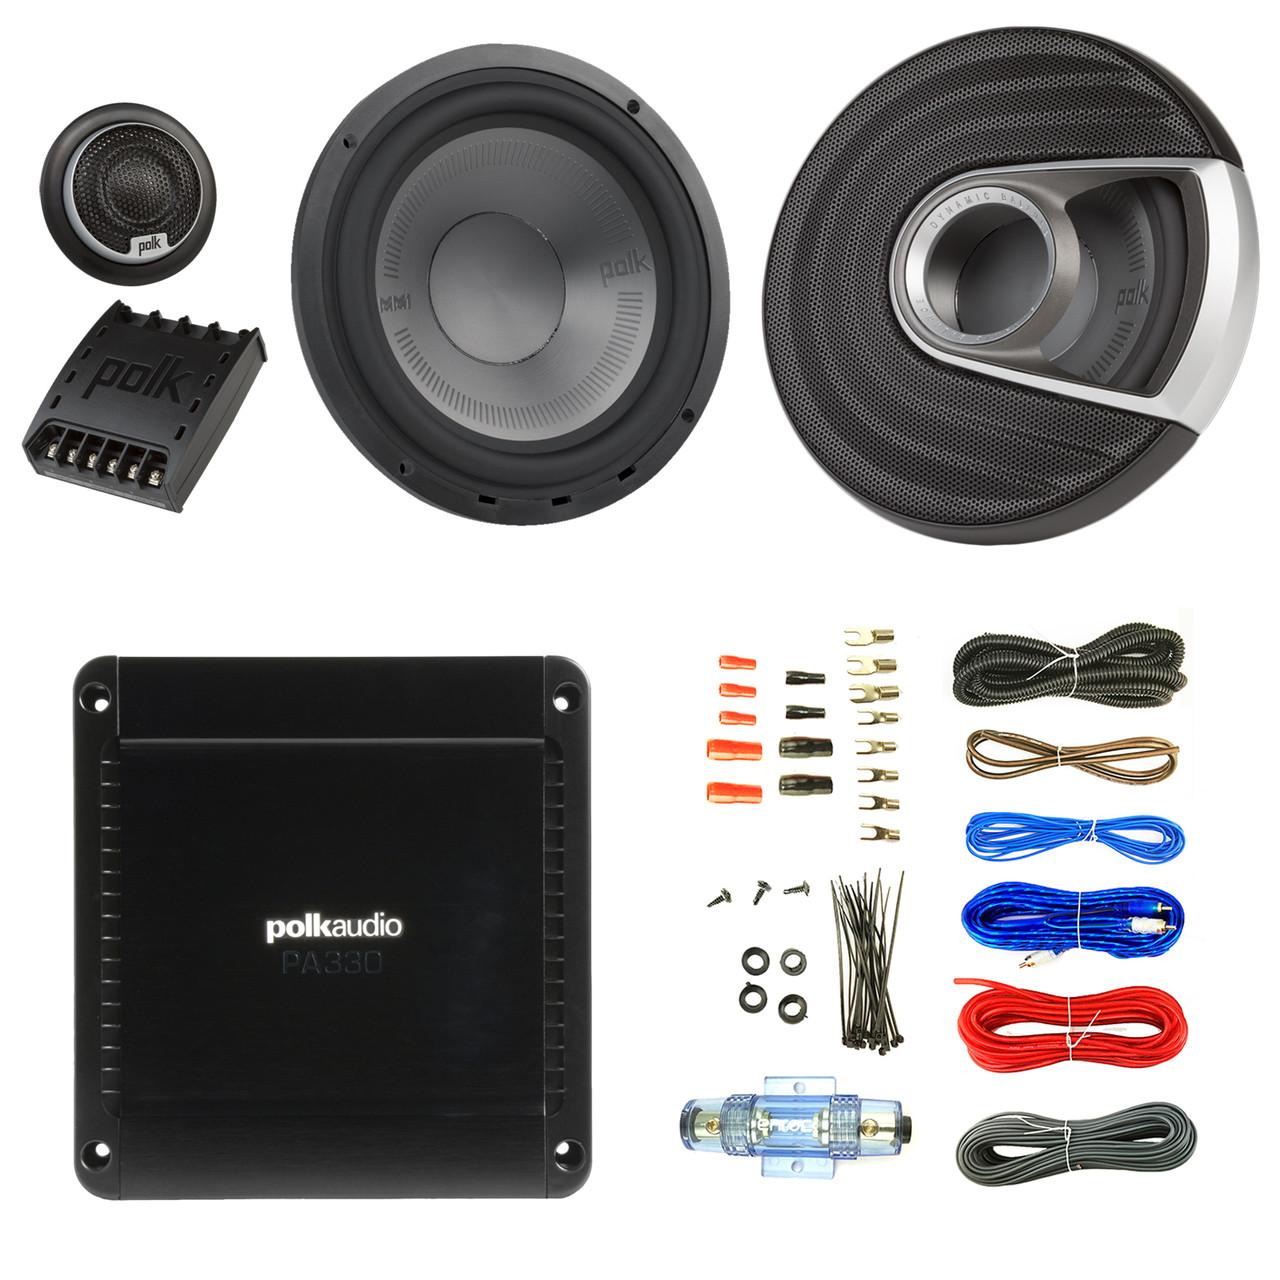 small resolution of 2x polk audio mm1 mm6502 series 375w ultra marine certified 6 5 component speaker system pa330 330w 2 channel car amplifier enrock audio 16 gauge 50 foot